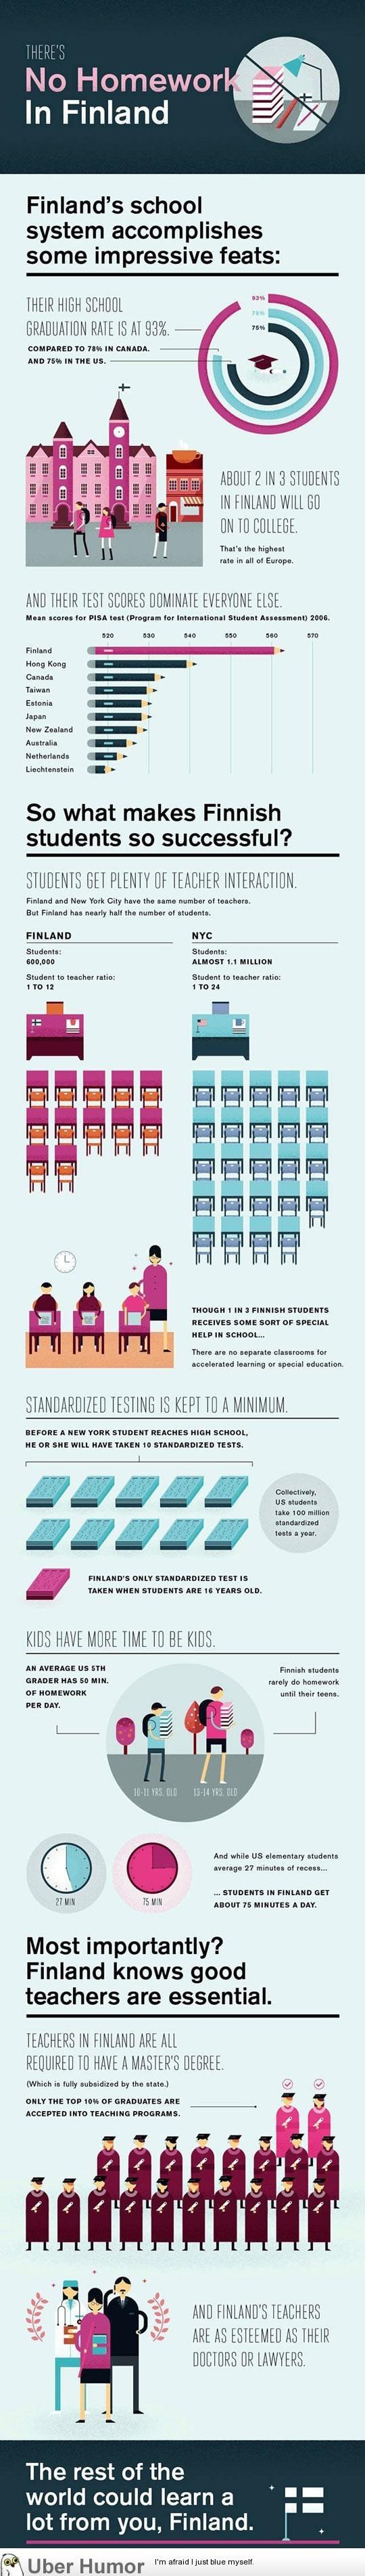 Sweden School System vs NYC School System